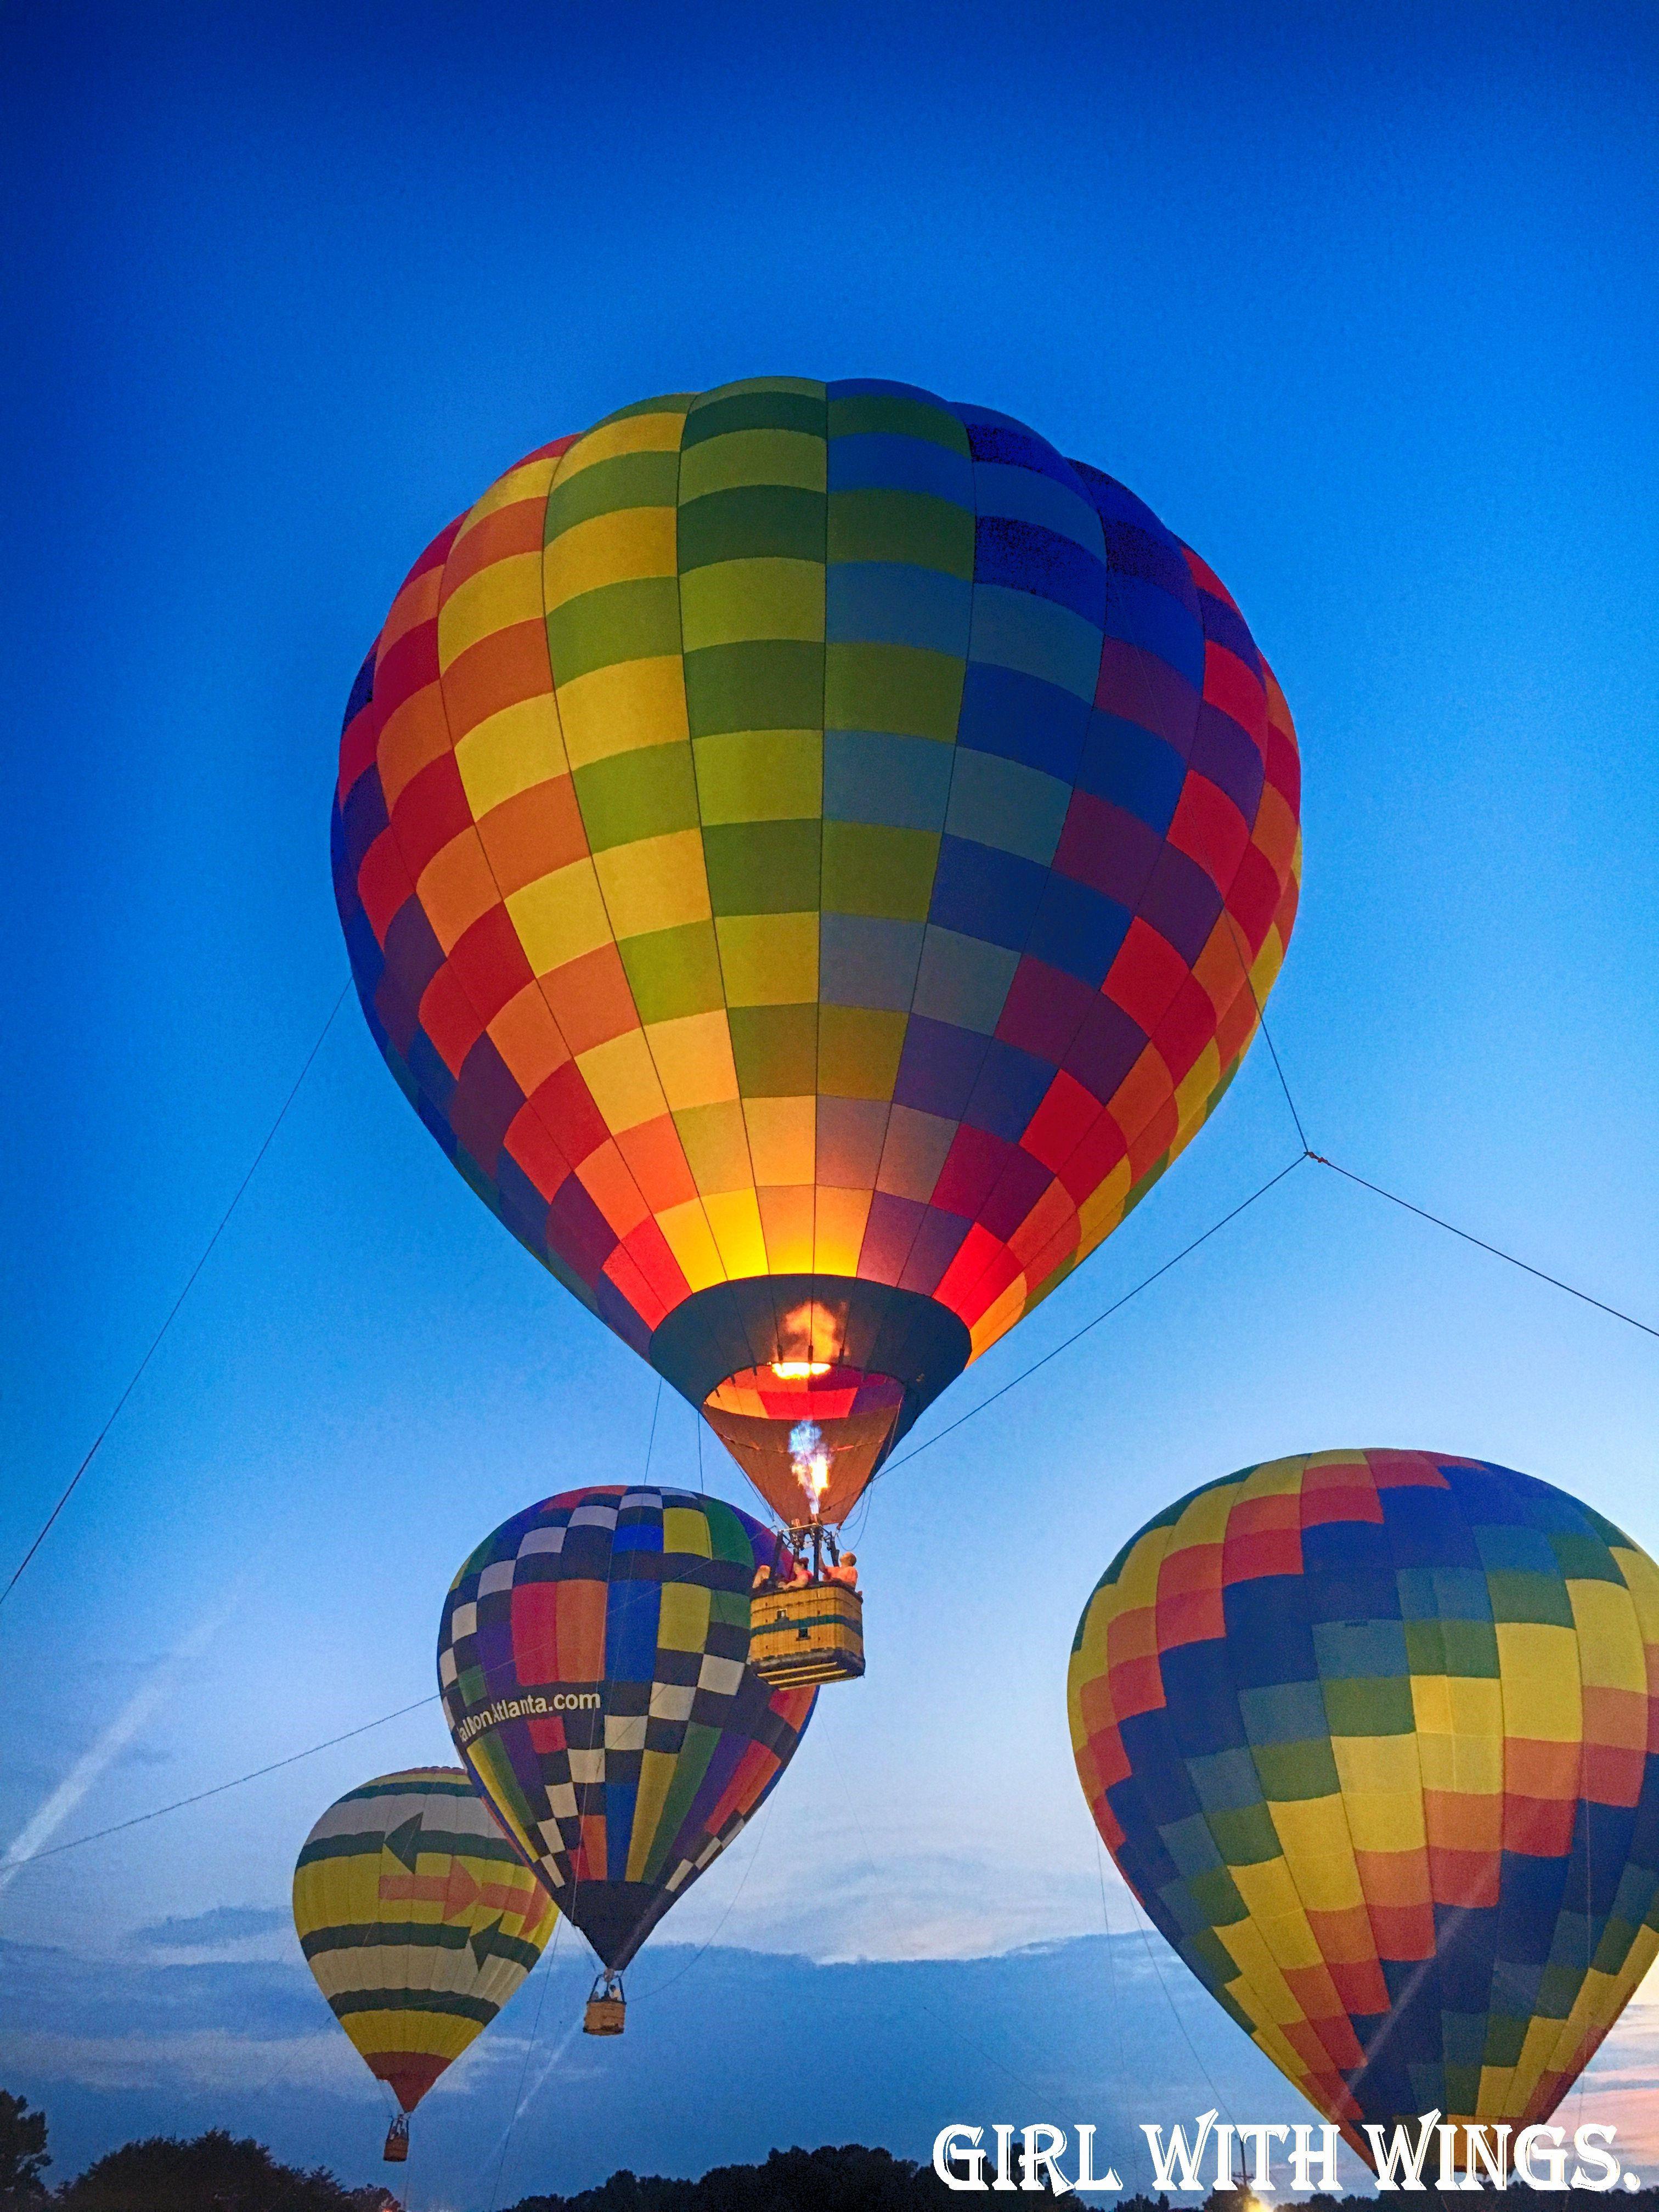 Hot Air Balloon Ride. Air balloon rides, Air balloon